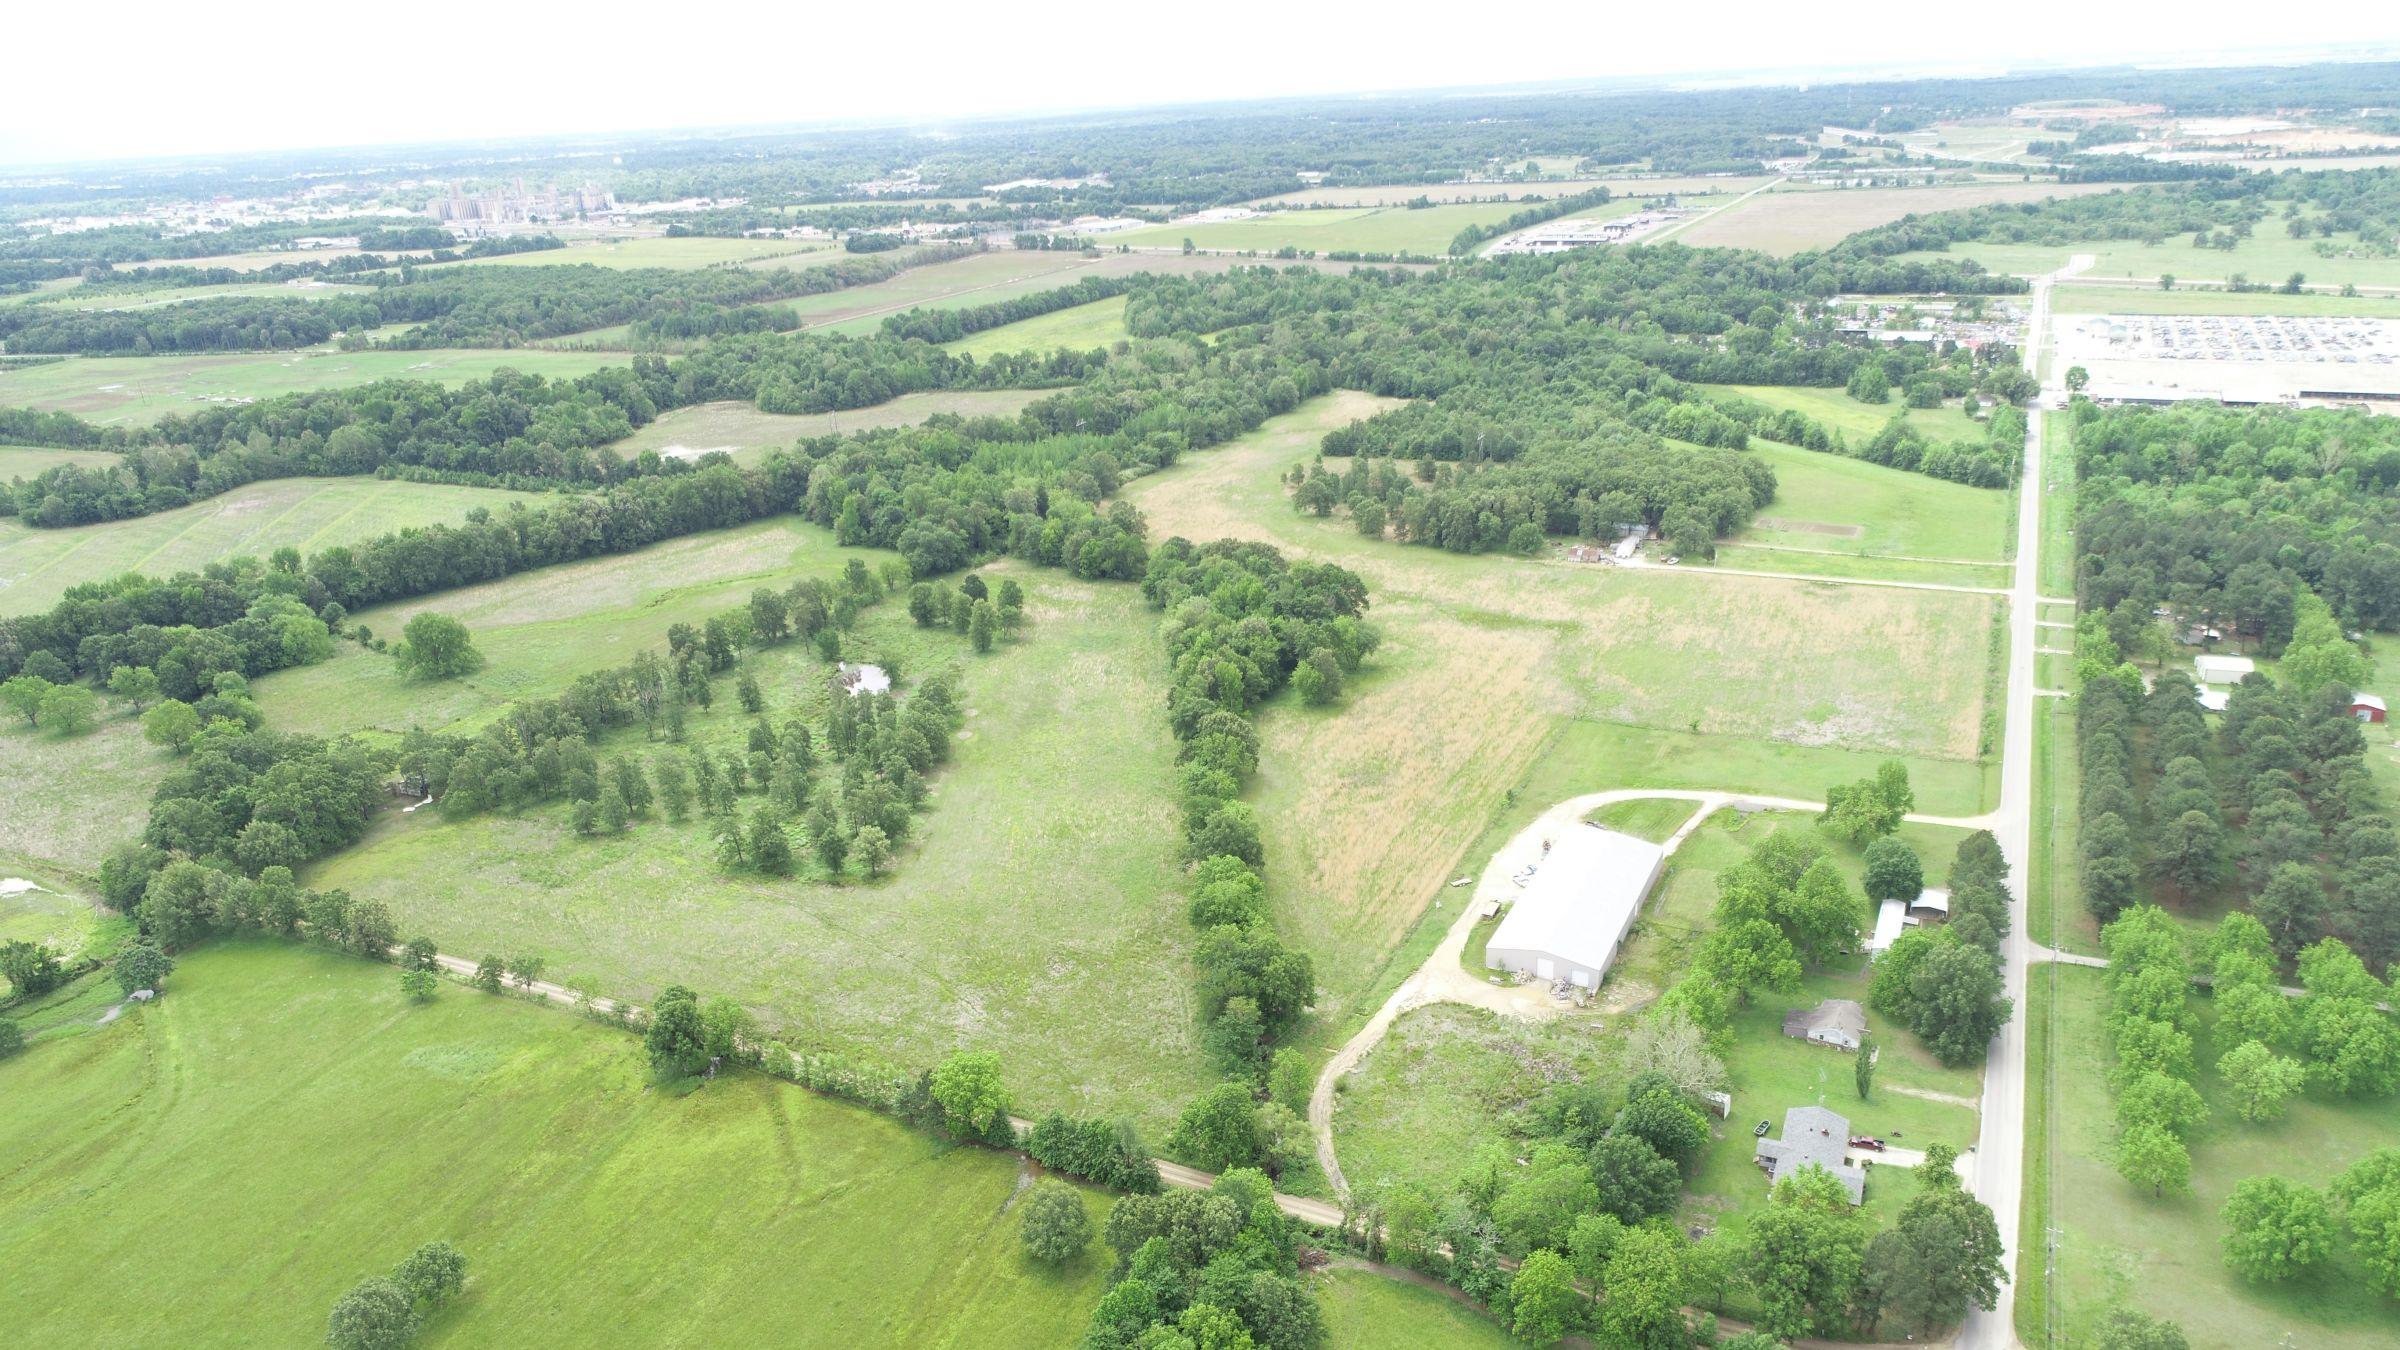 land-craighead-county-arkansas-52-acres-listing-number-15002-0-2020-06-01-215645.JPG